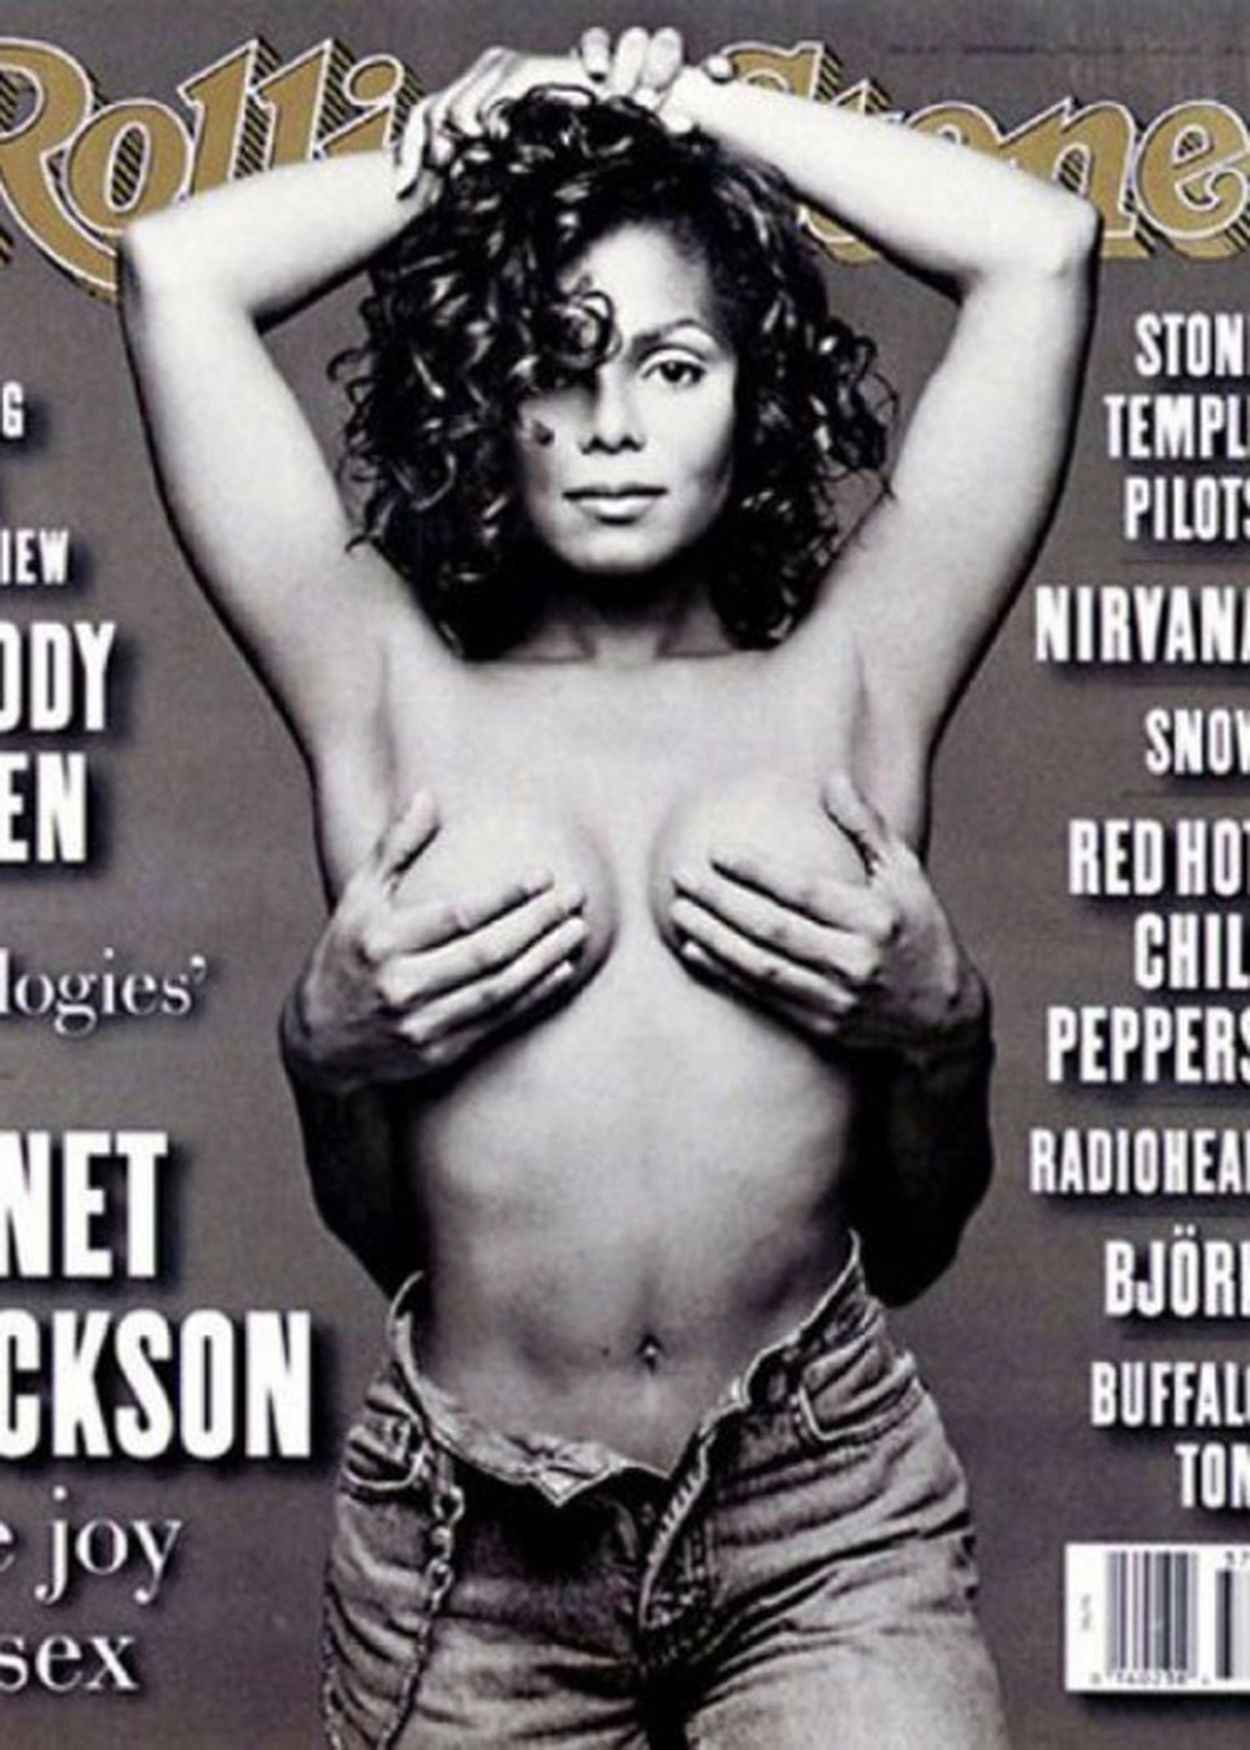 3. Janet Jackson